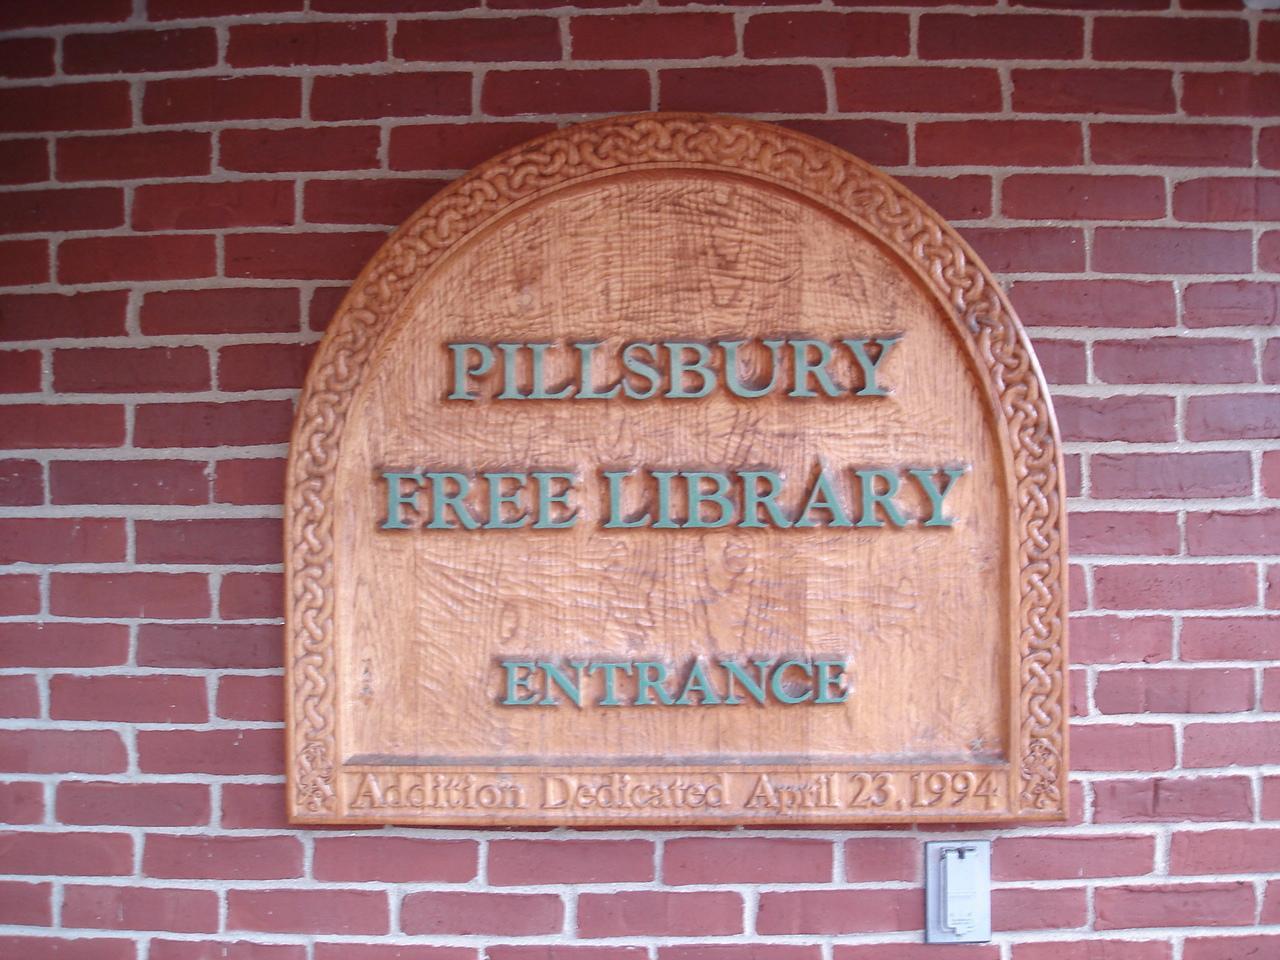 sign-pillsburylibrary